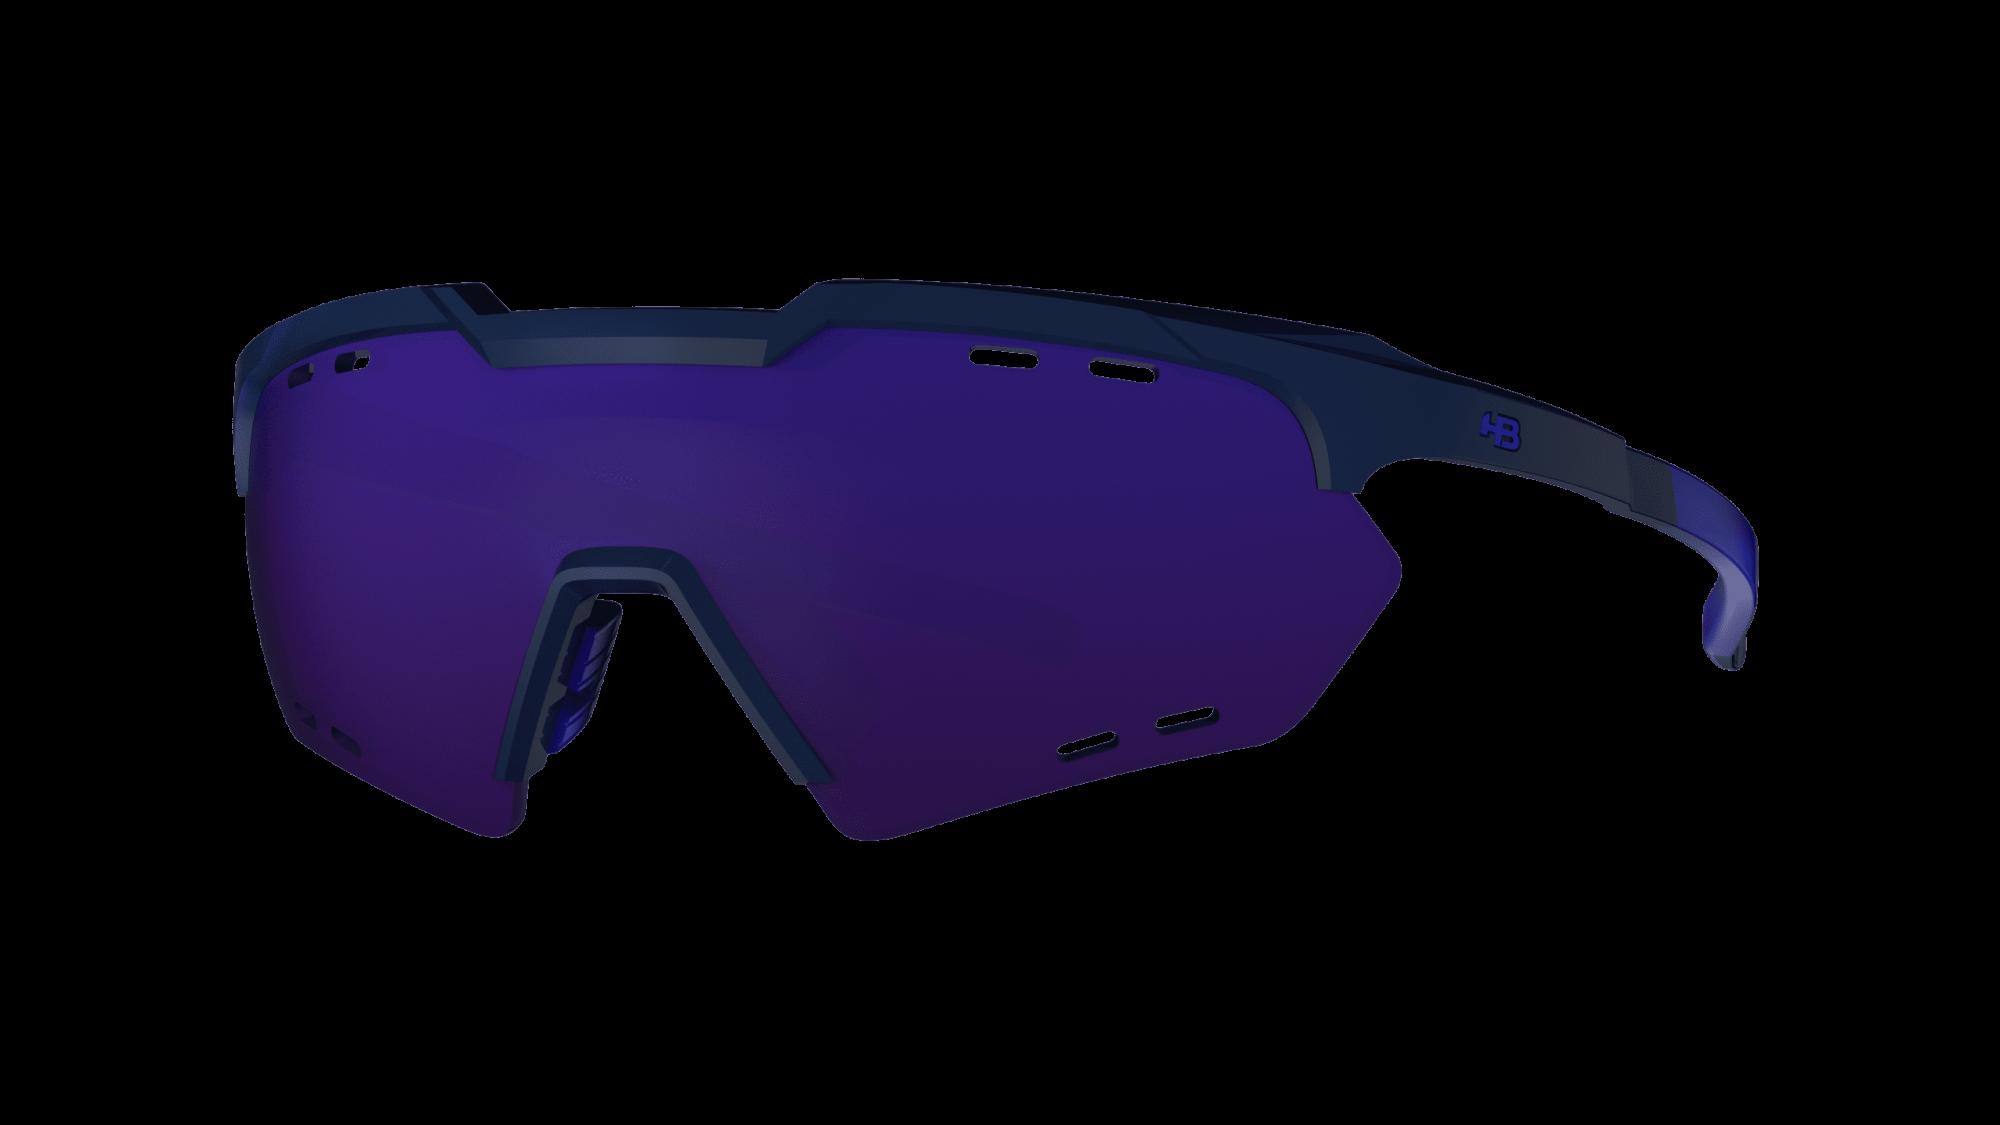 Óculos Shield Compact Small Mountain HB M Black D Blue Multi Purple